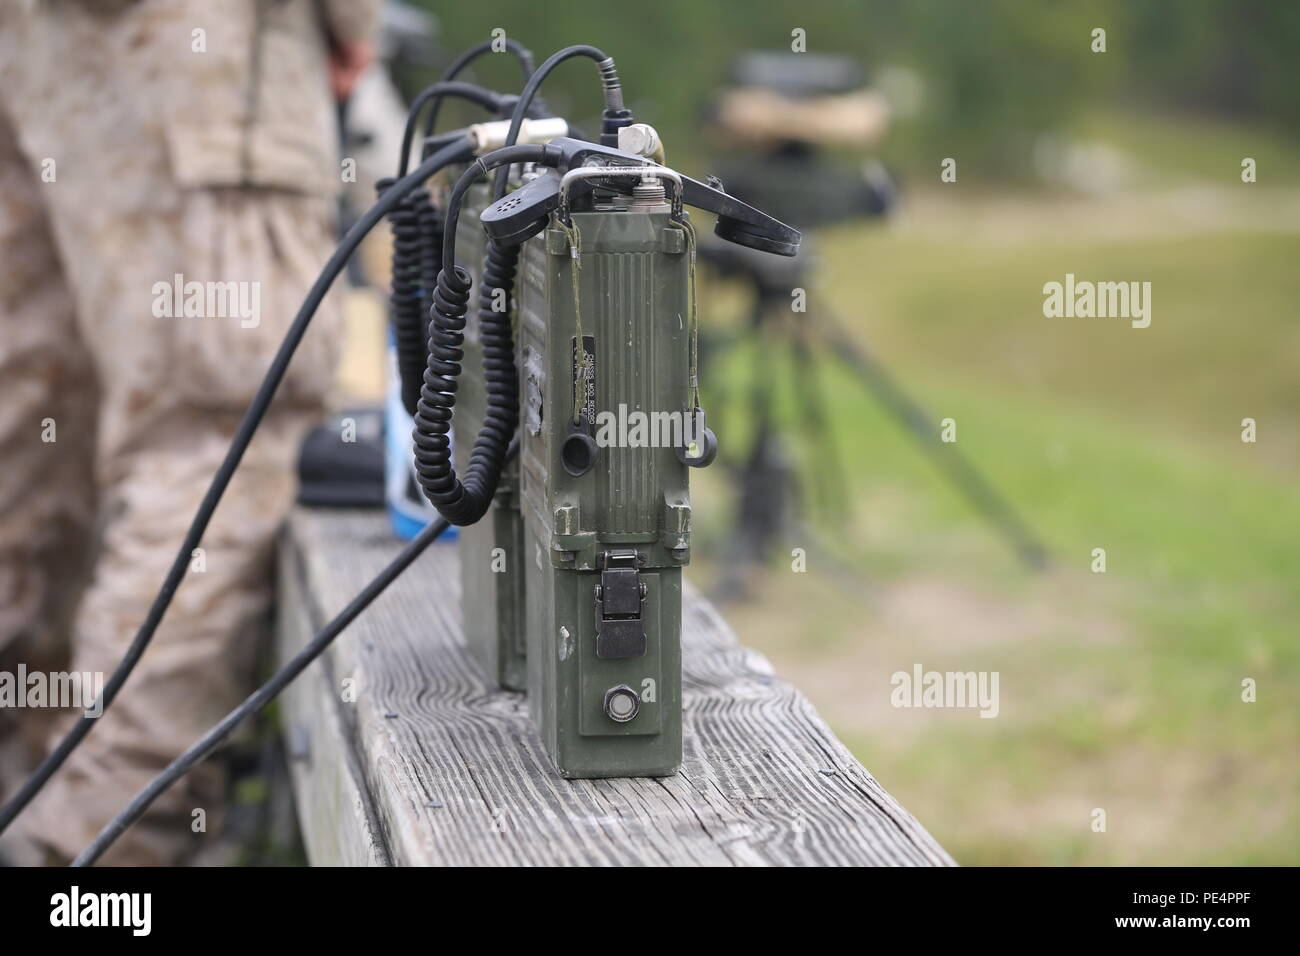 Prc 117 Radios Stock Photos & Prc 117 Radios Stock Images - Alamy